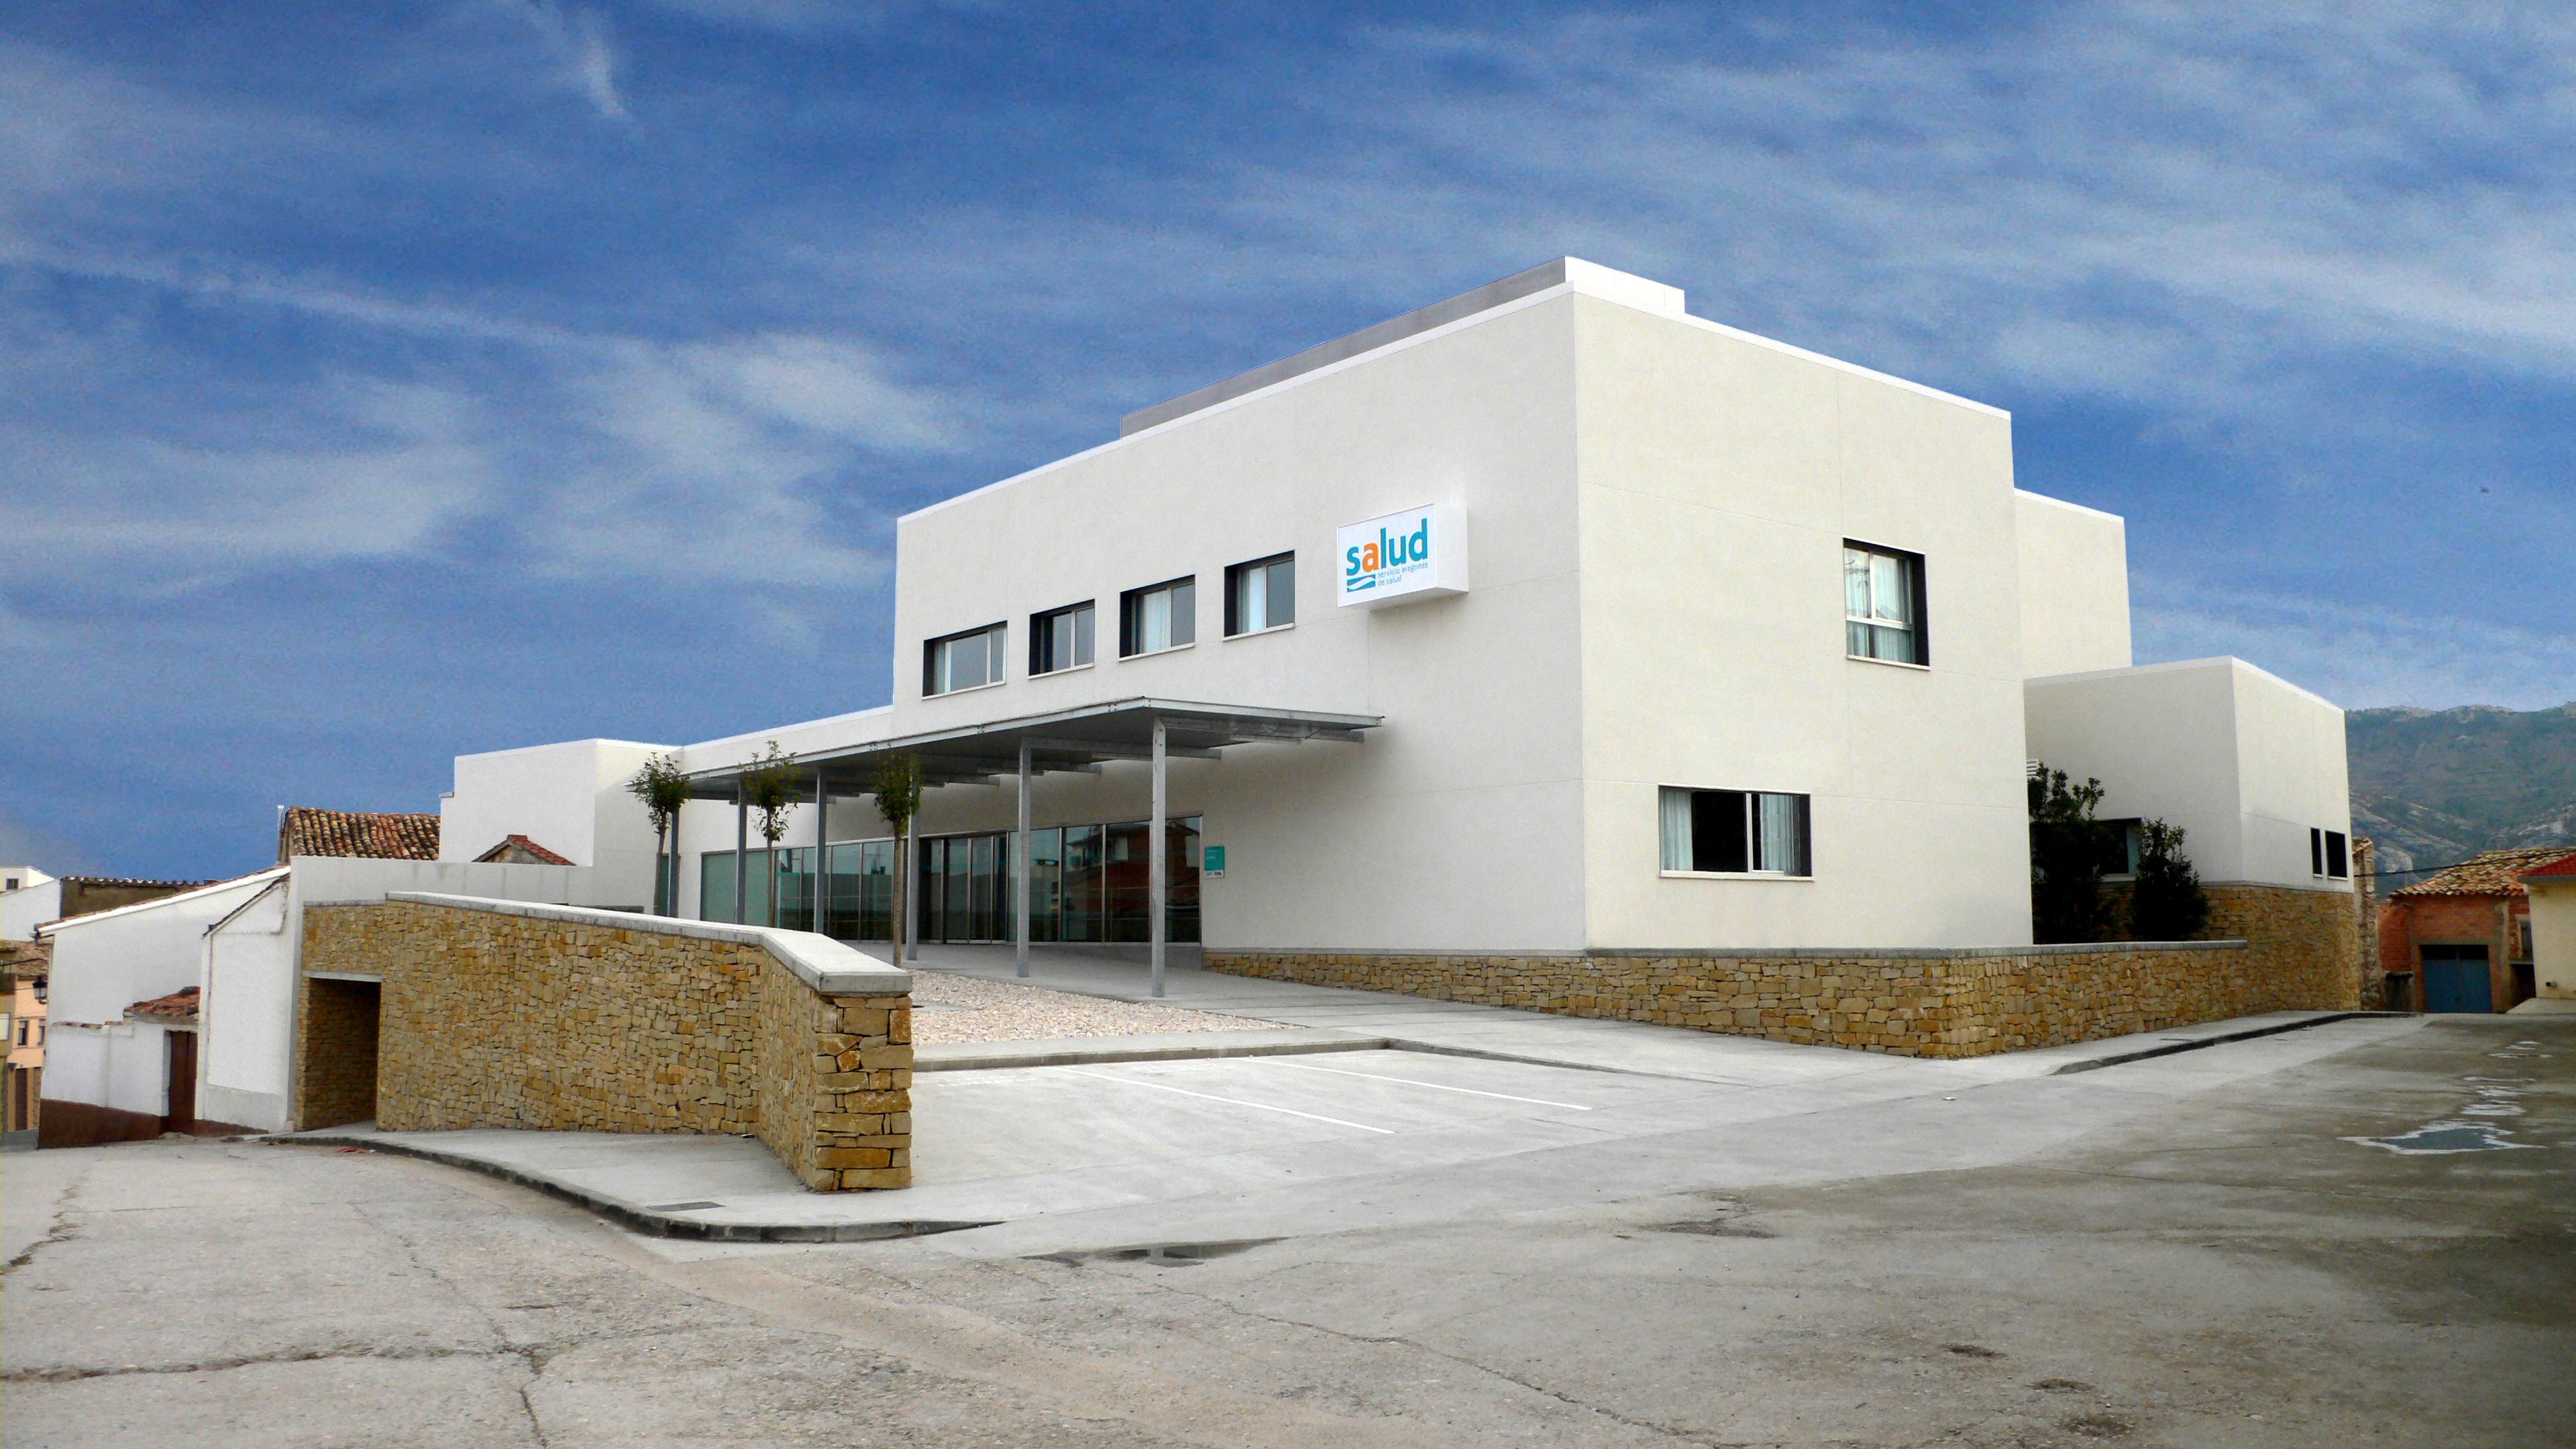 Centro de Salud, Calanda